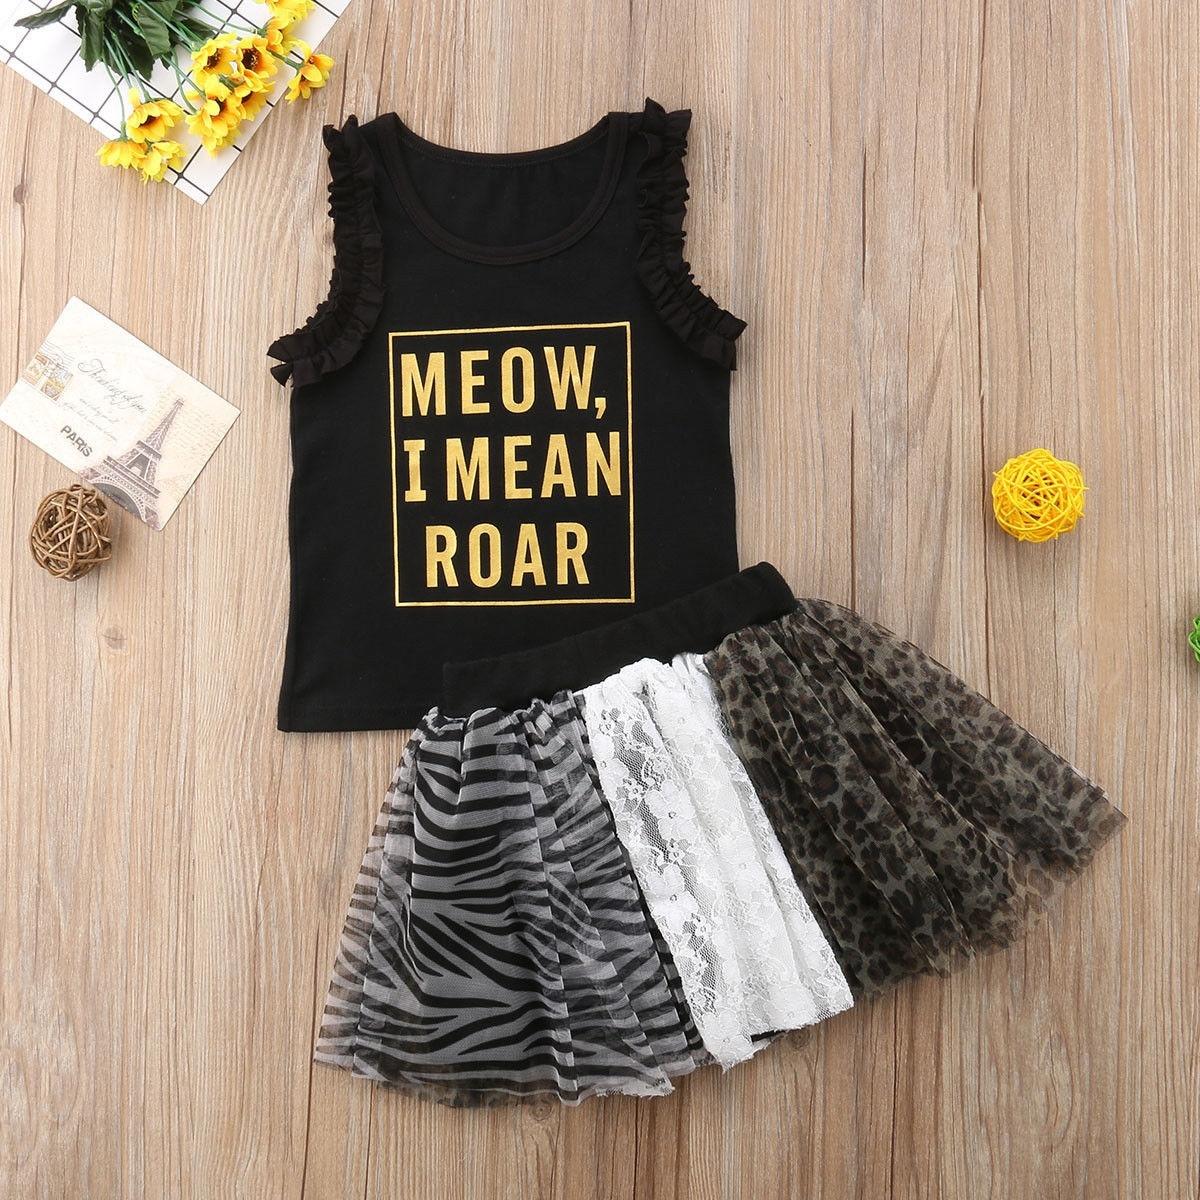 Fashion Toddler Kids Baby Girls Sleeveless Top T-shirt + Lace Tutu Skirt Dress Outfit Set Clothes